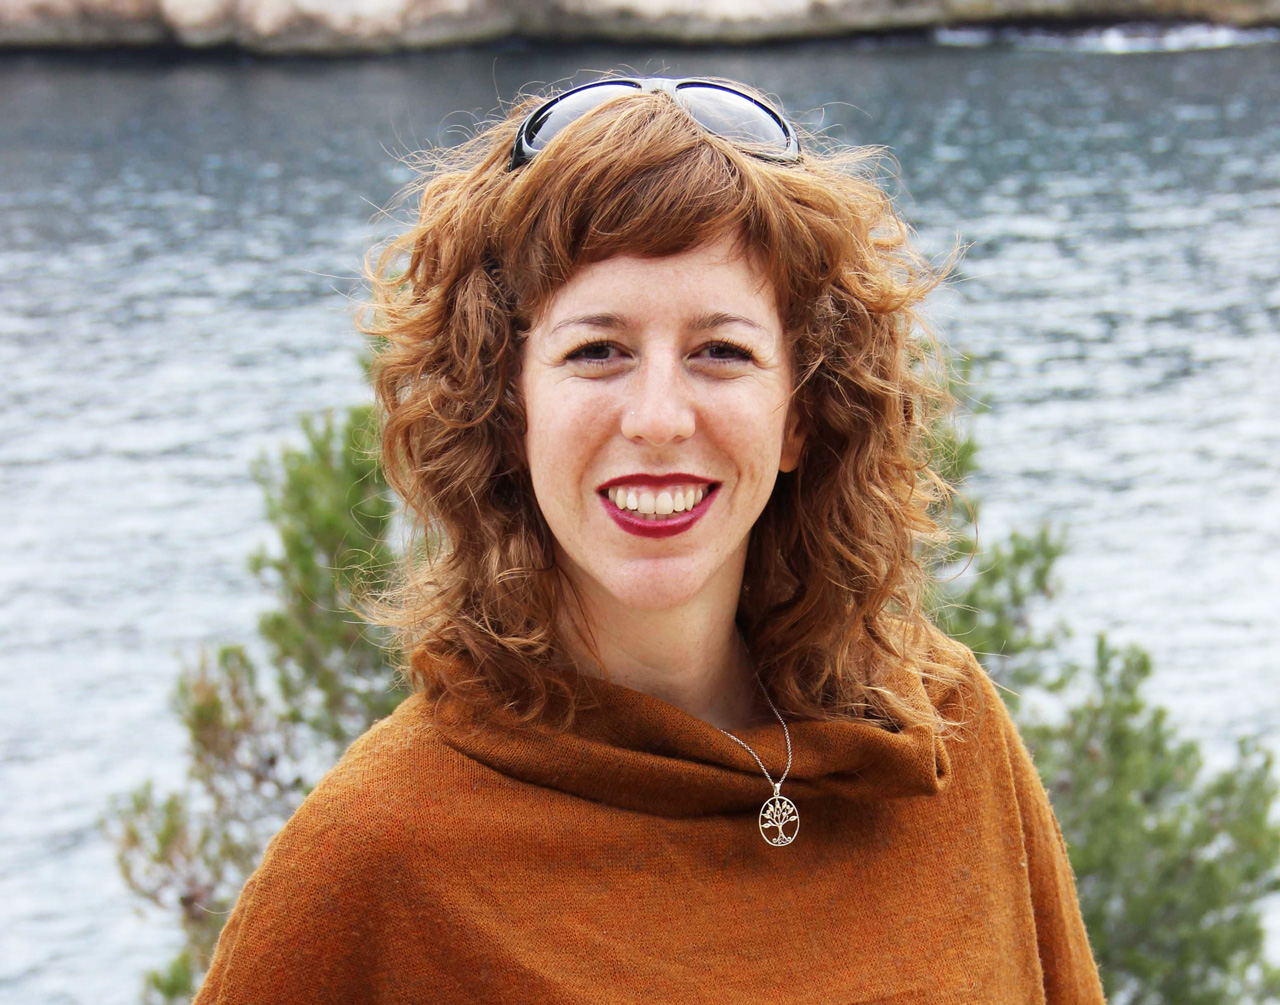 Olivia-Blanchard-Women-of-Barcelona-Blog